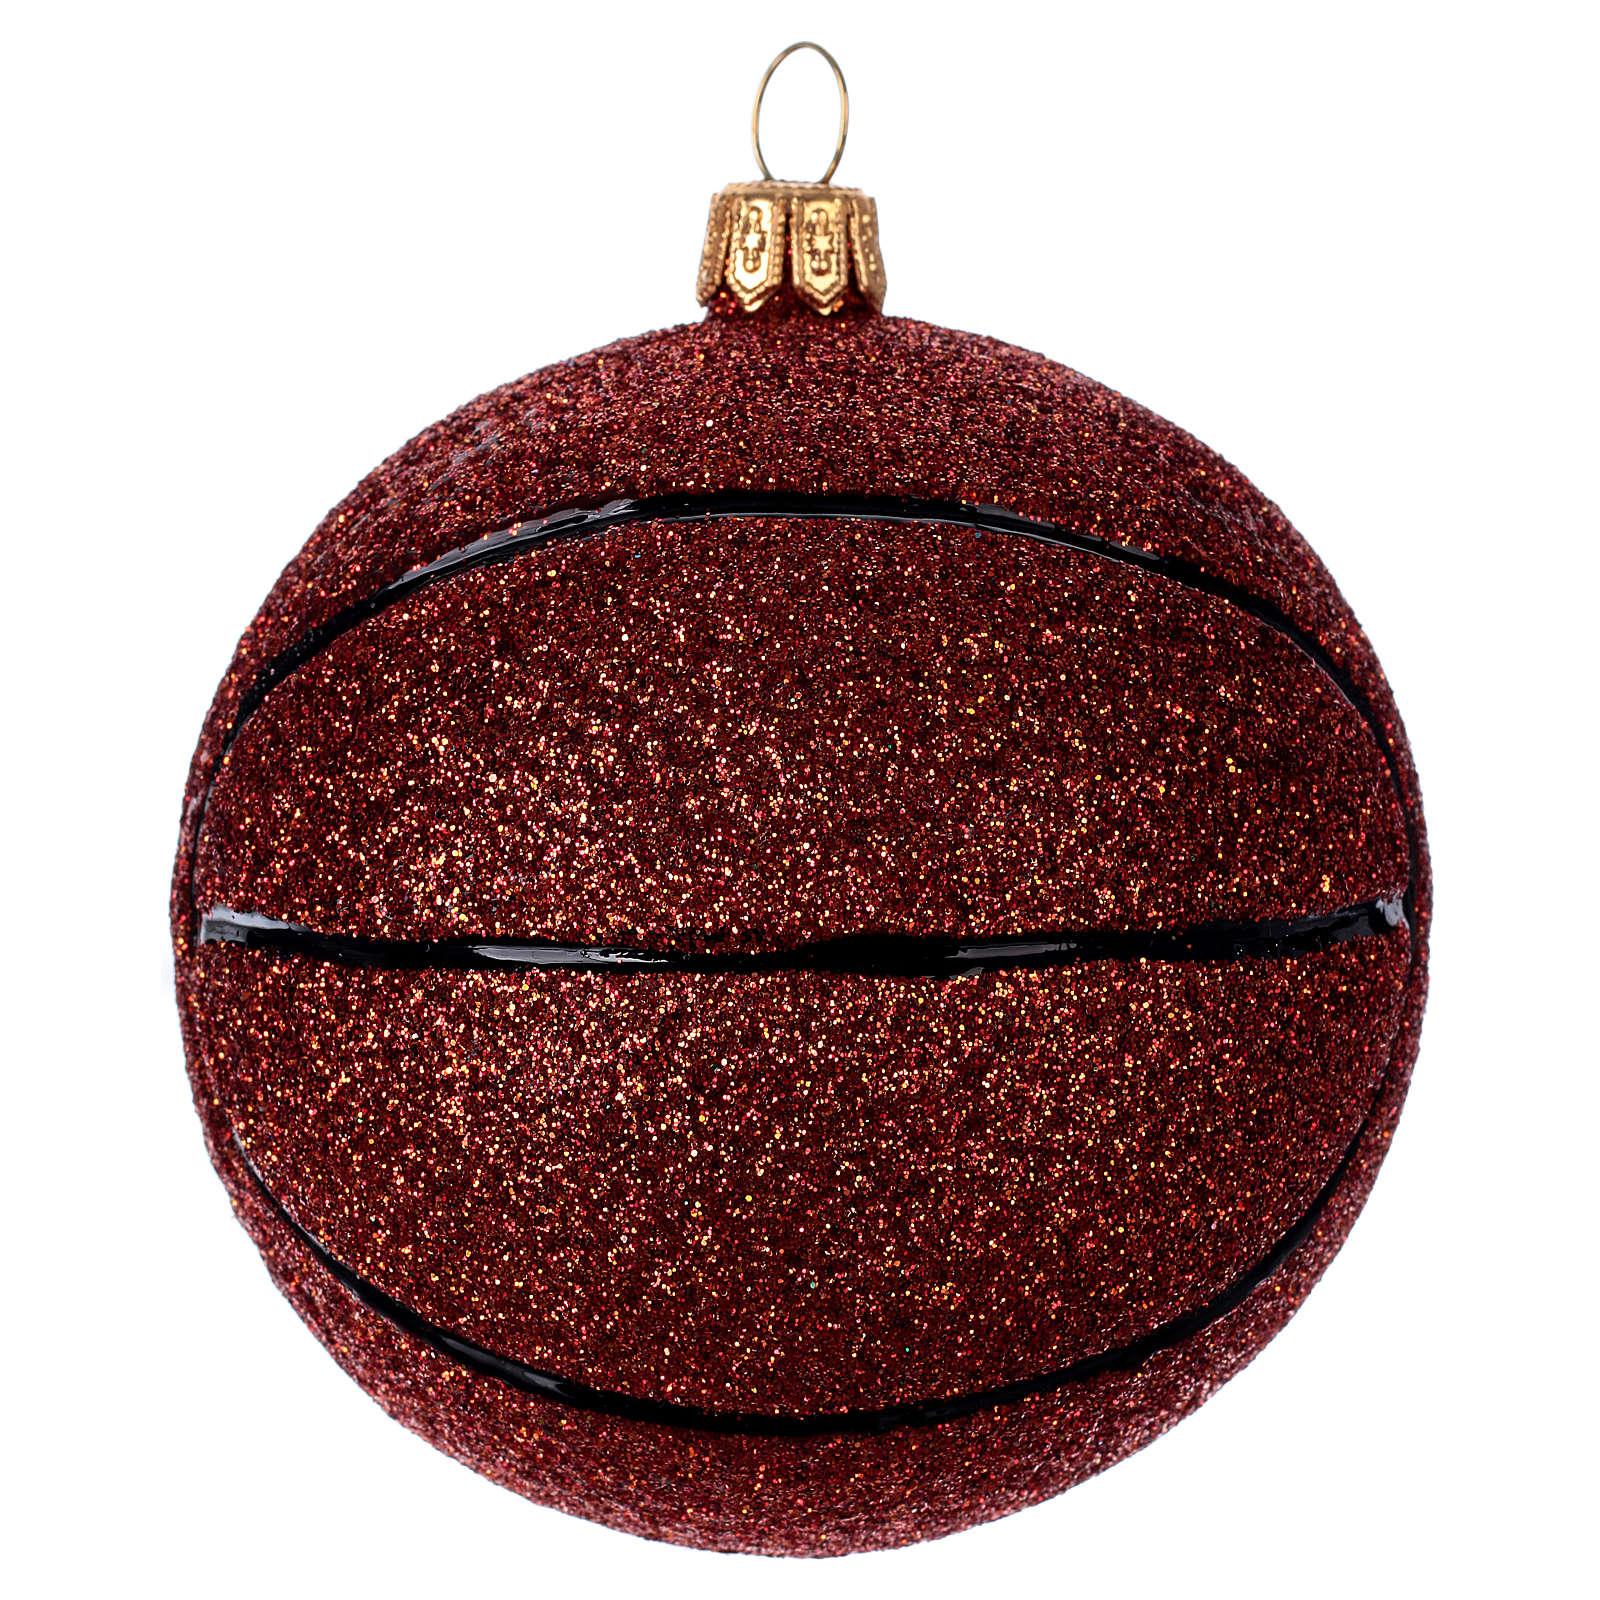 Blown glass Christmas ornament, basketball 4